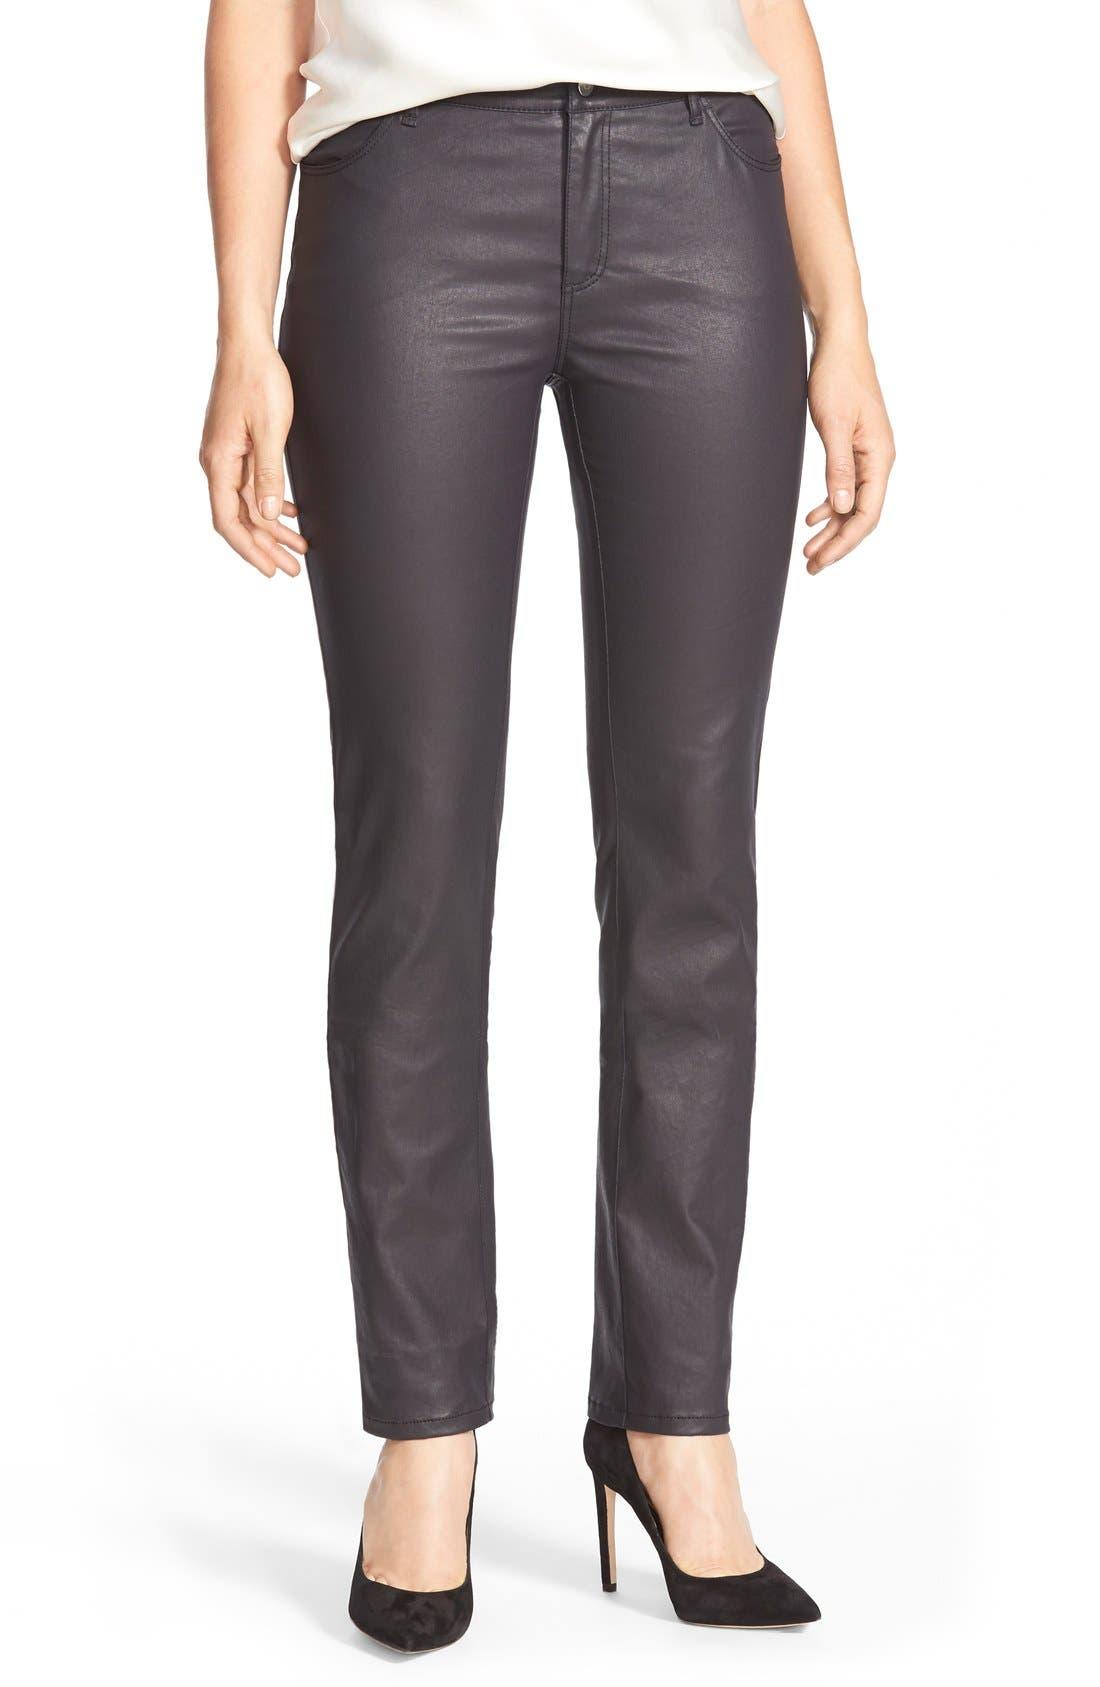 LAFAYETTE 148 NEW YORK Waxed Denim Slim Leg Jeans, Main, color, INK